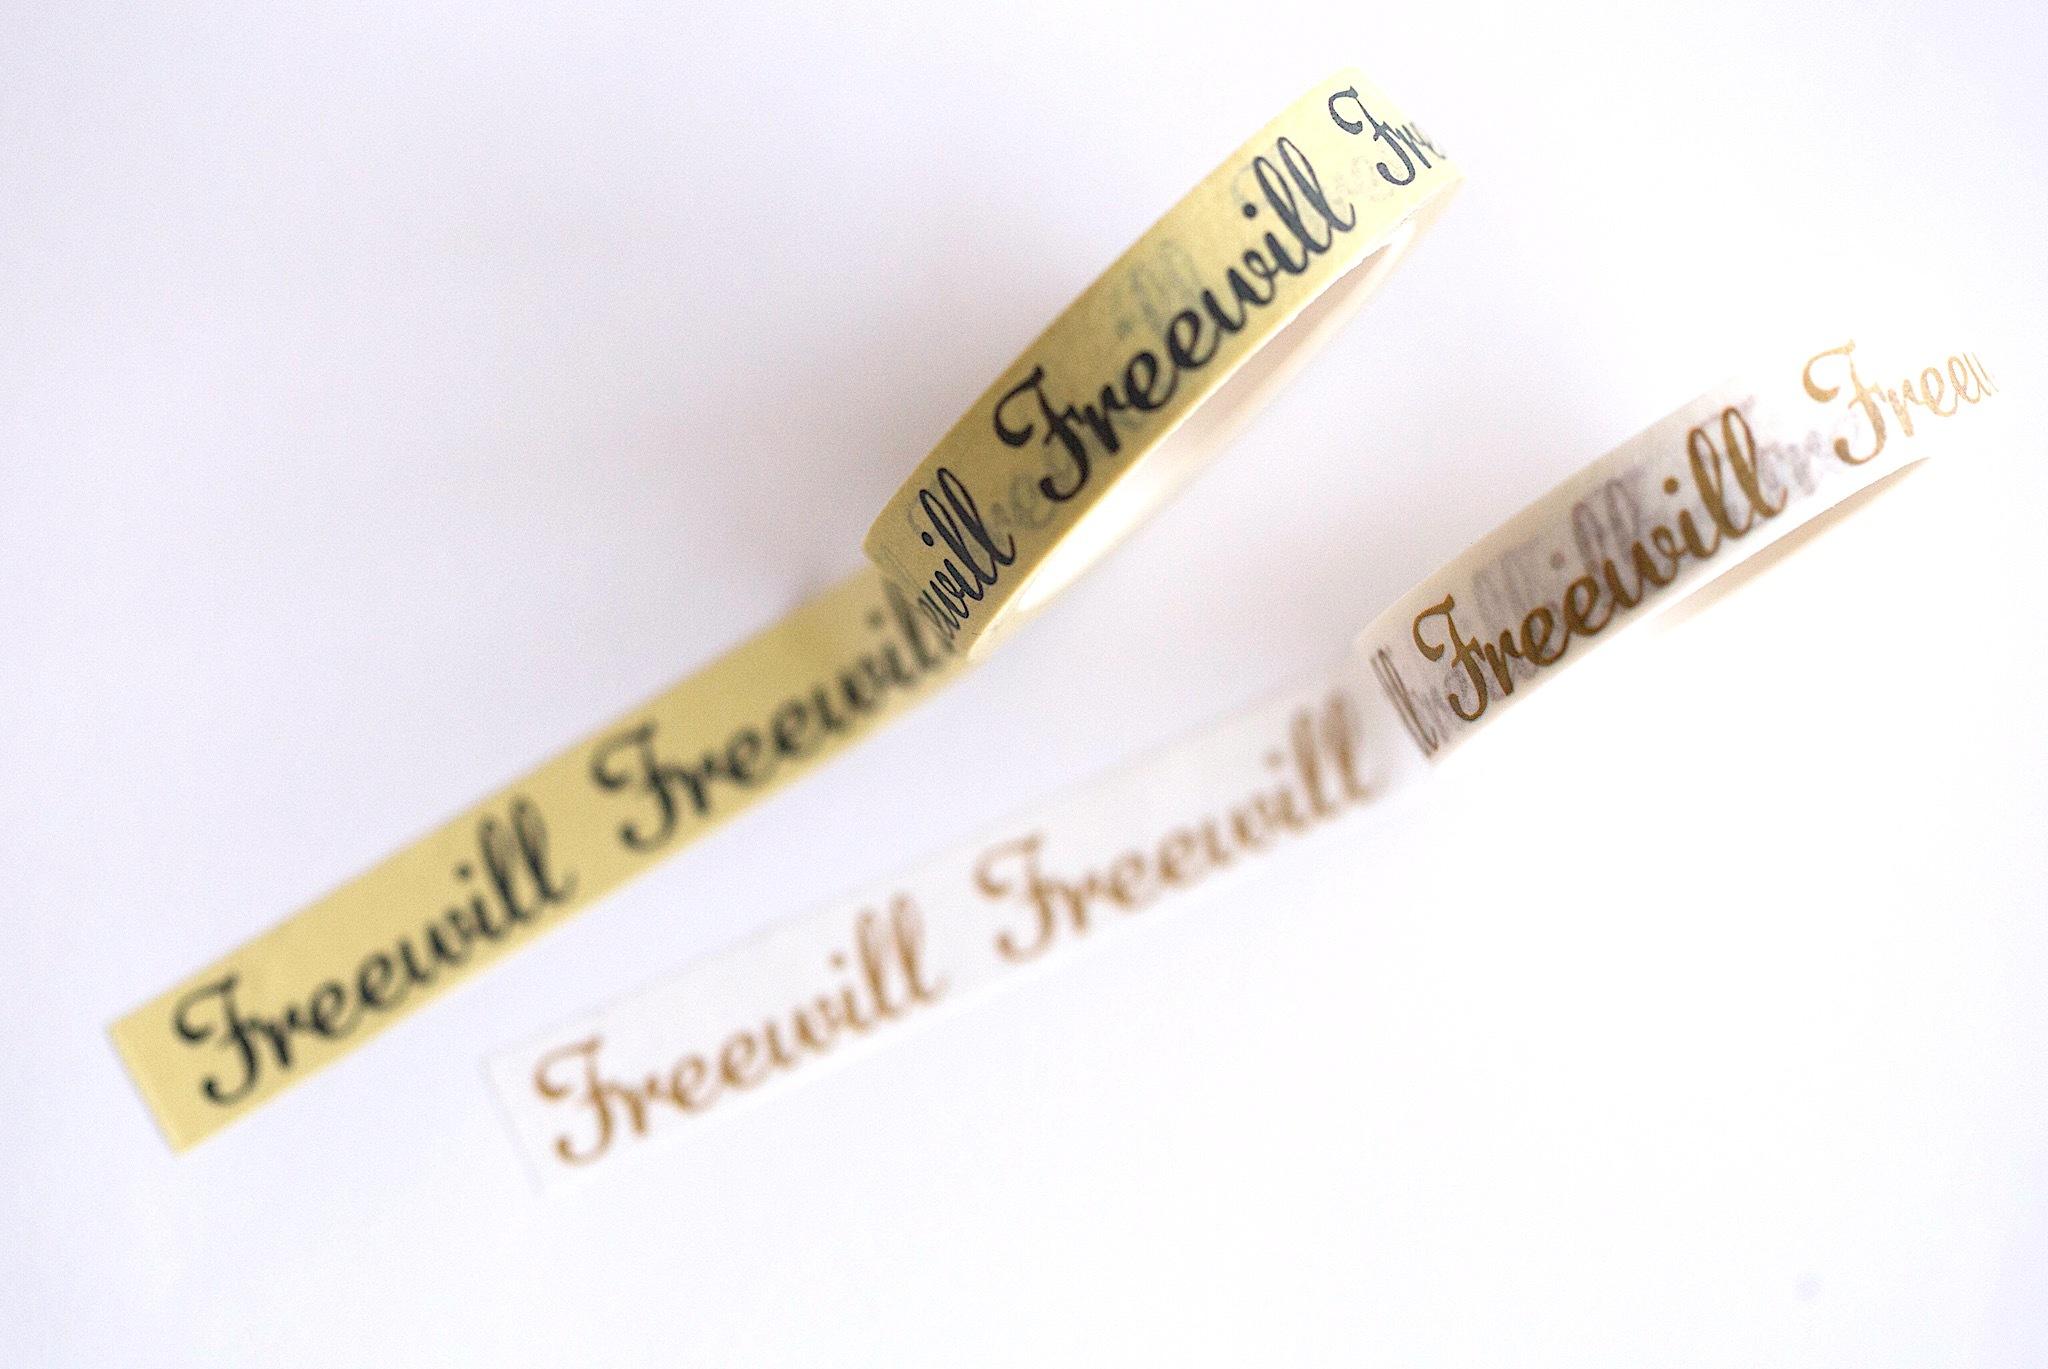 Freewill オリジナルマステセット